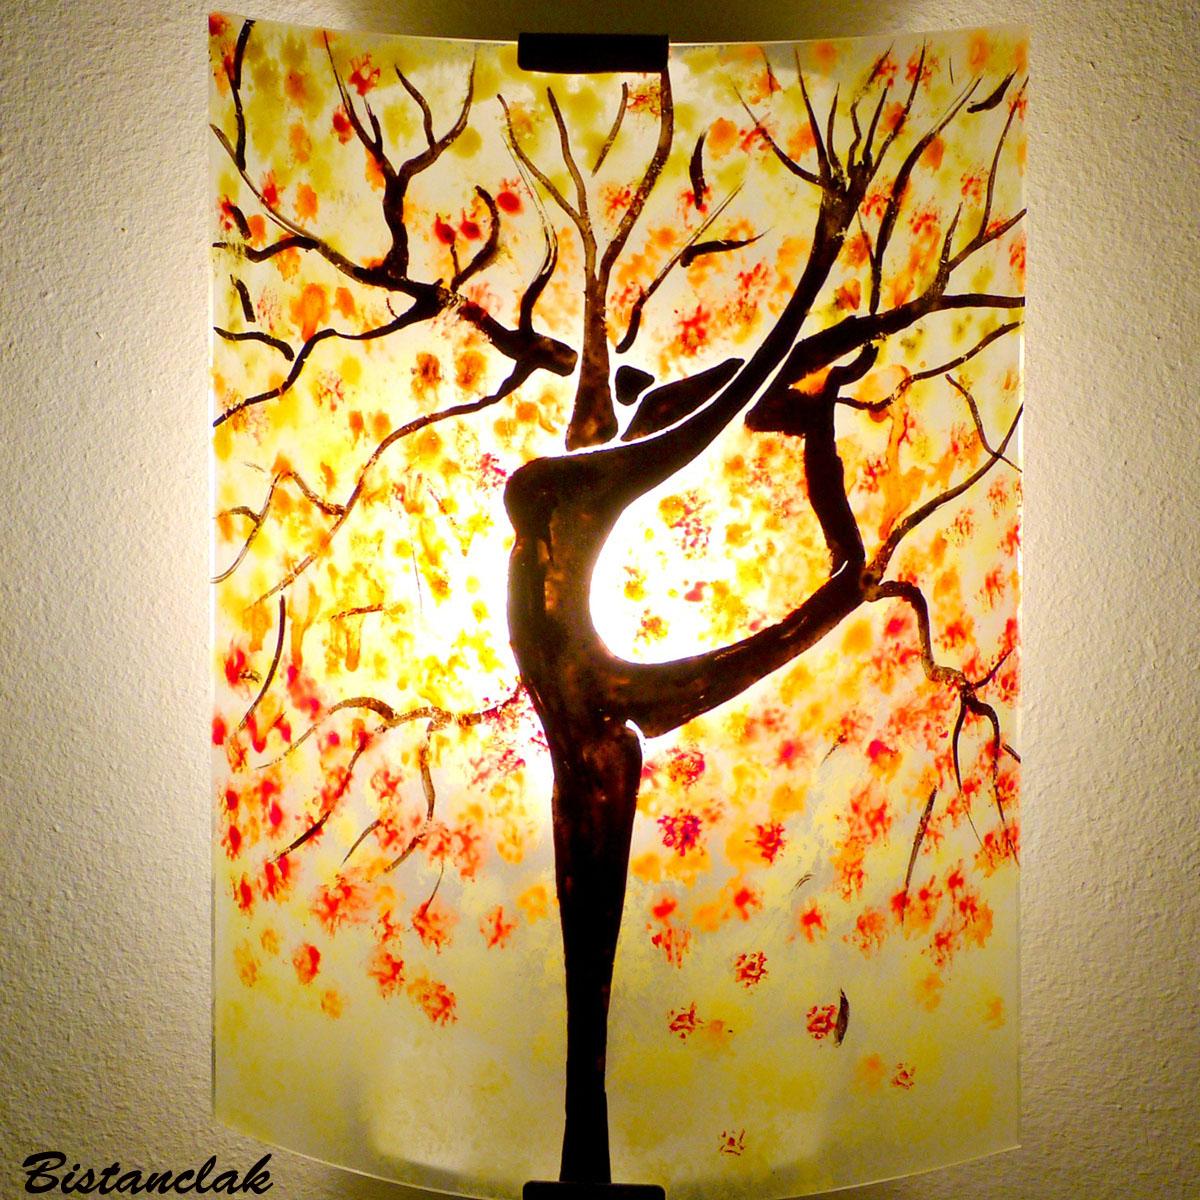 Applique murale jaune orange rouge pastel motif arbre danseuse 6